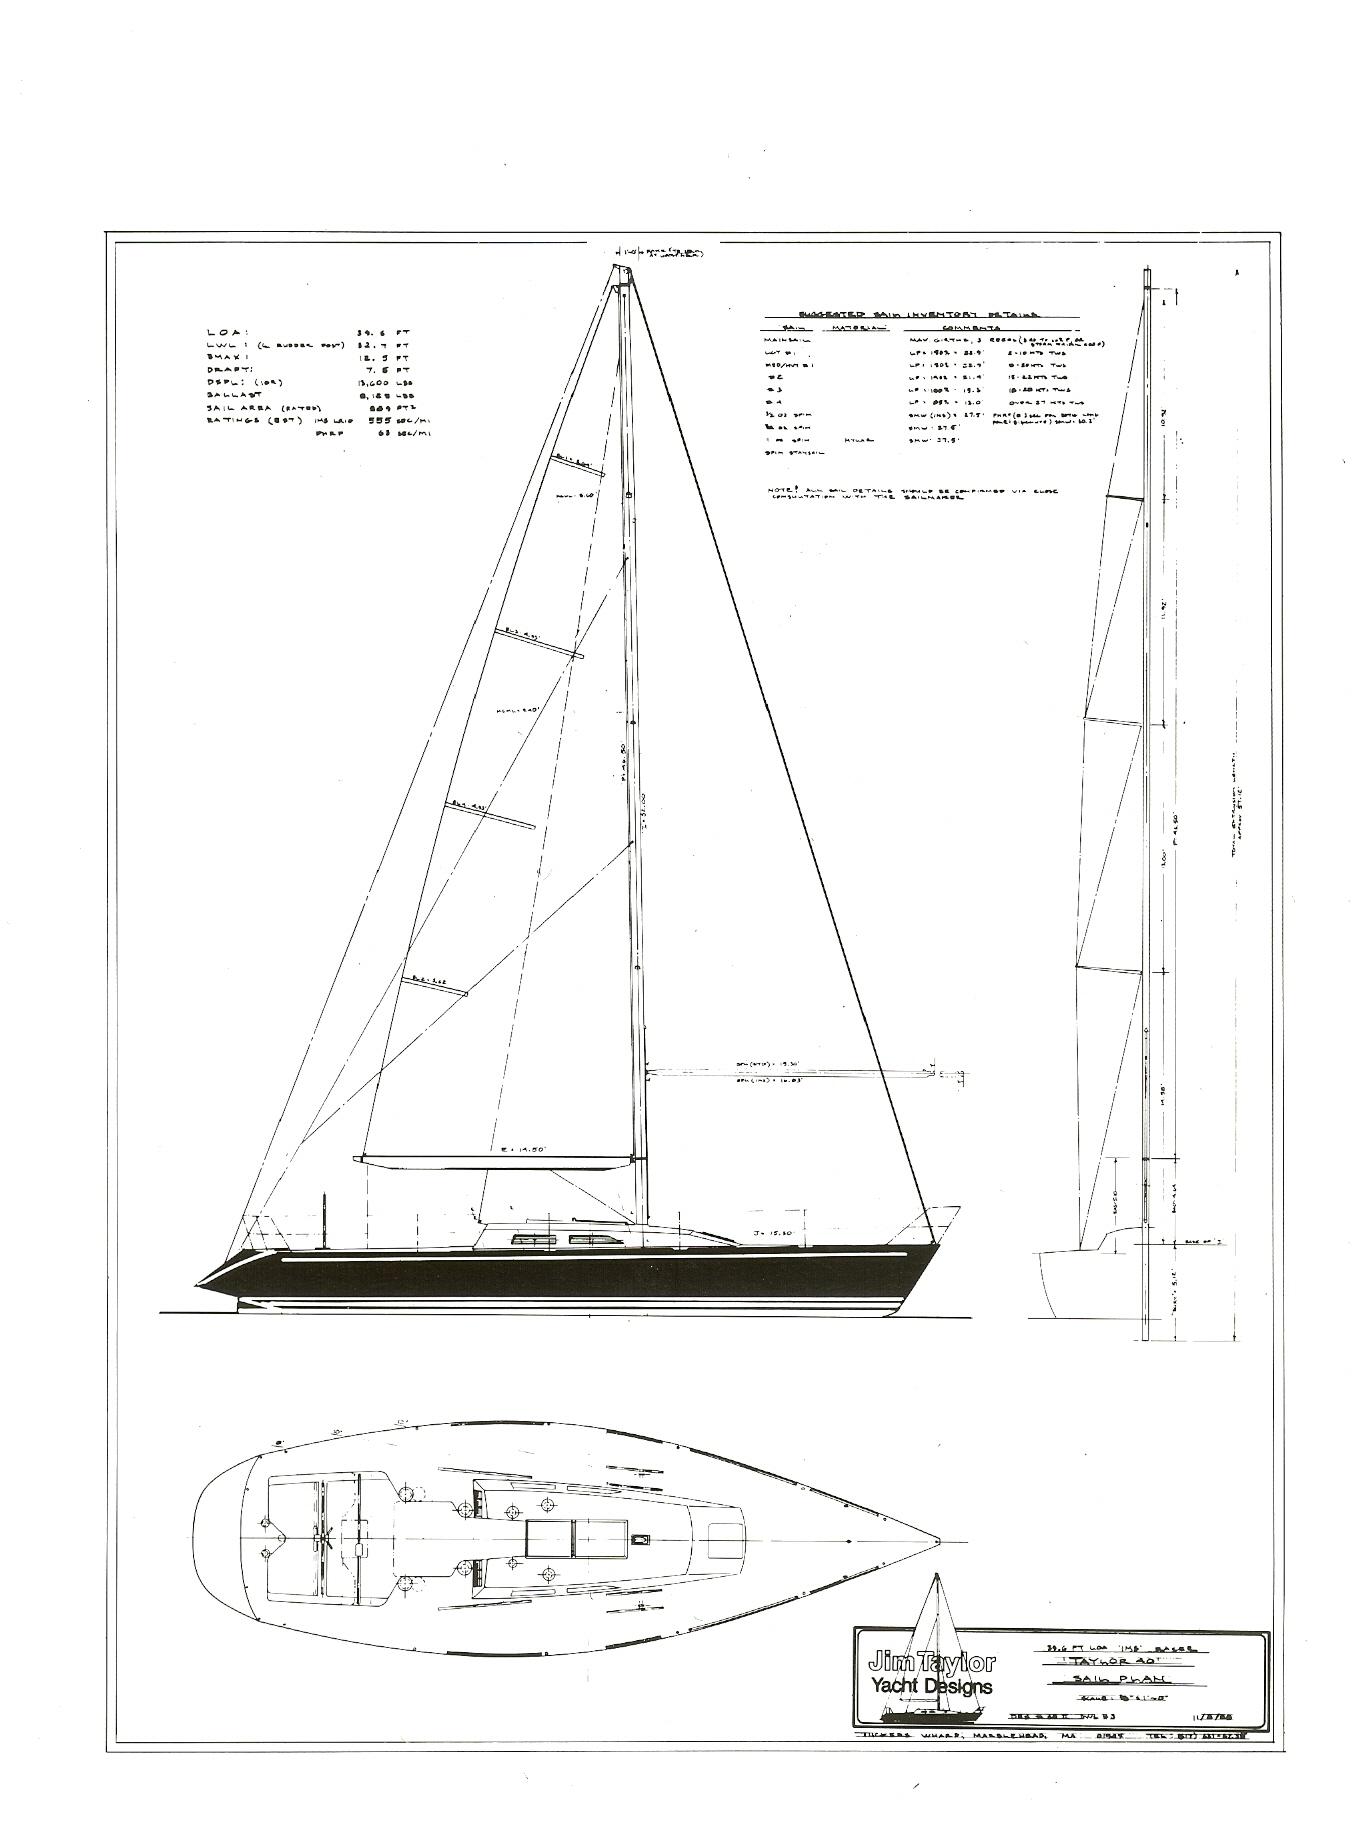 C:\Users\Jim Taylor\Desktop\JTYD\JT_Promo\WebSite\2013\Designs\Racing\68_T40's\Sailplan_080122.jpg